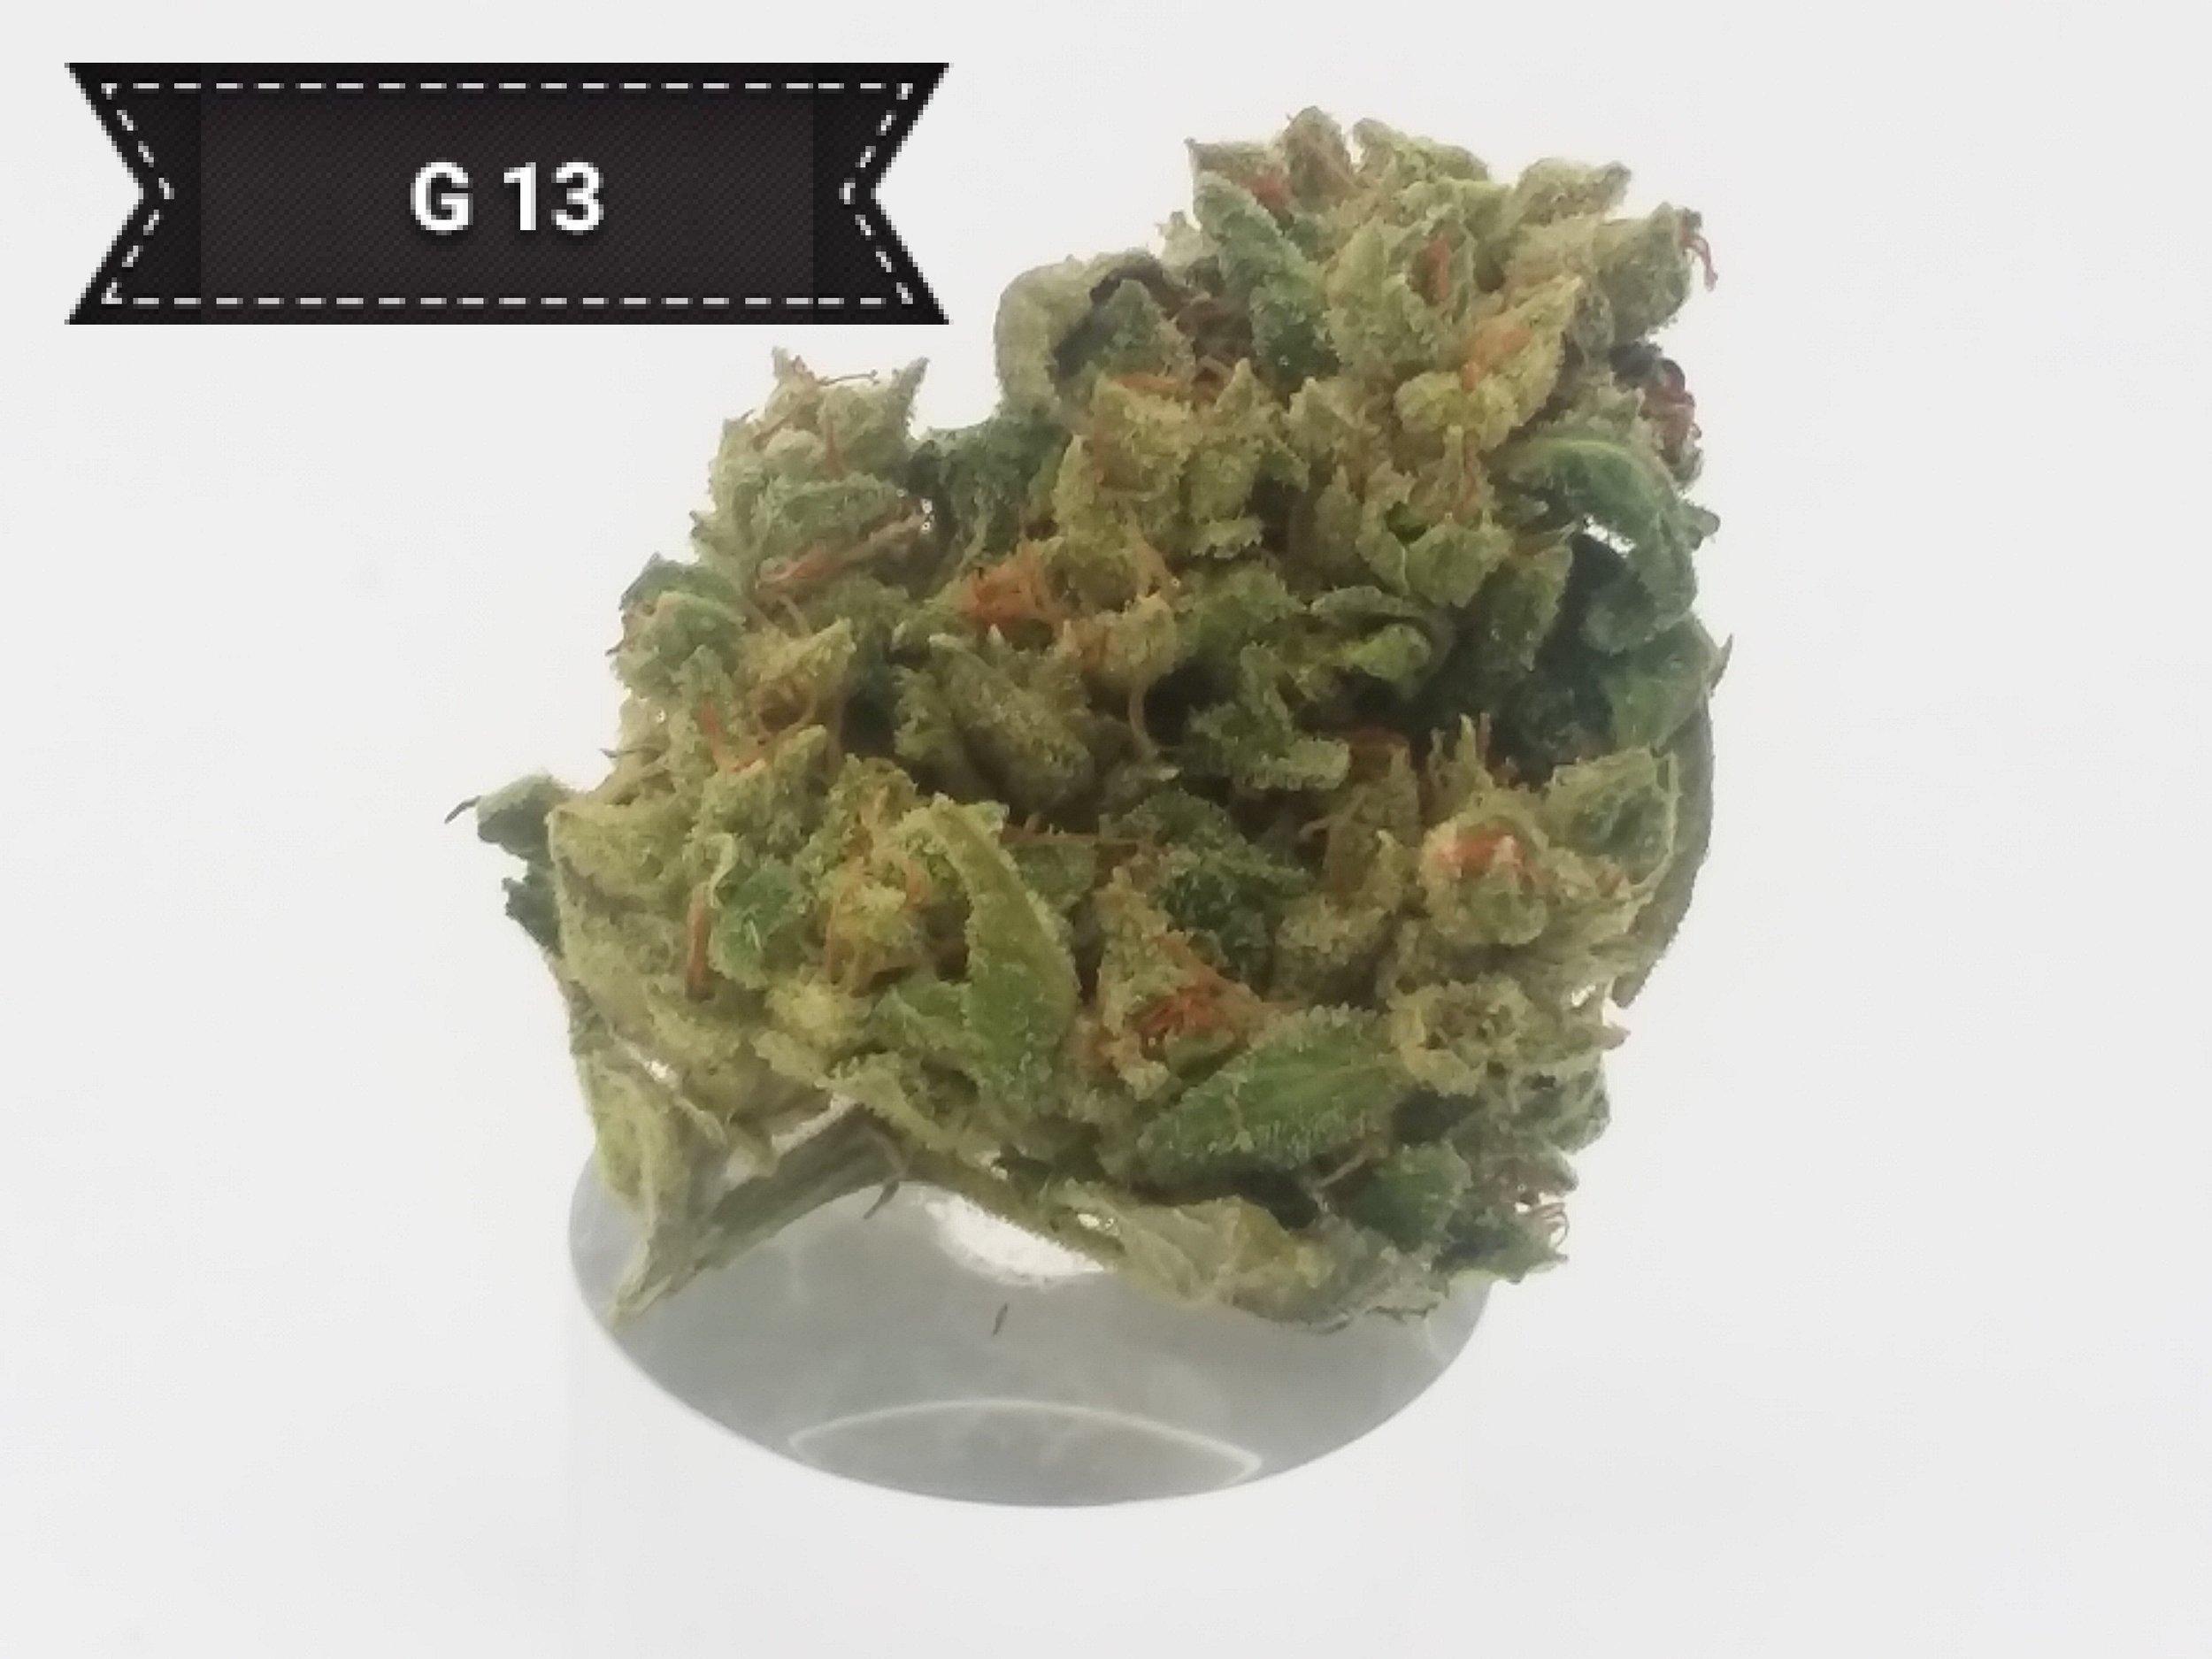 G13.jpg